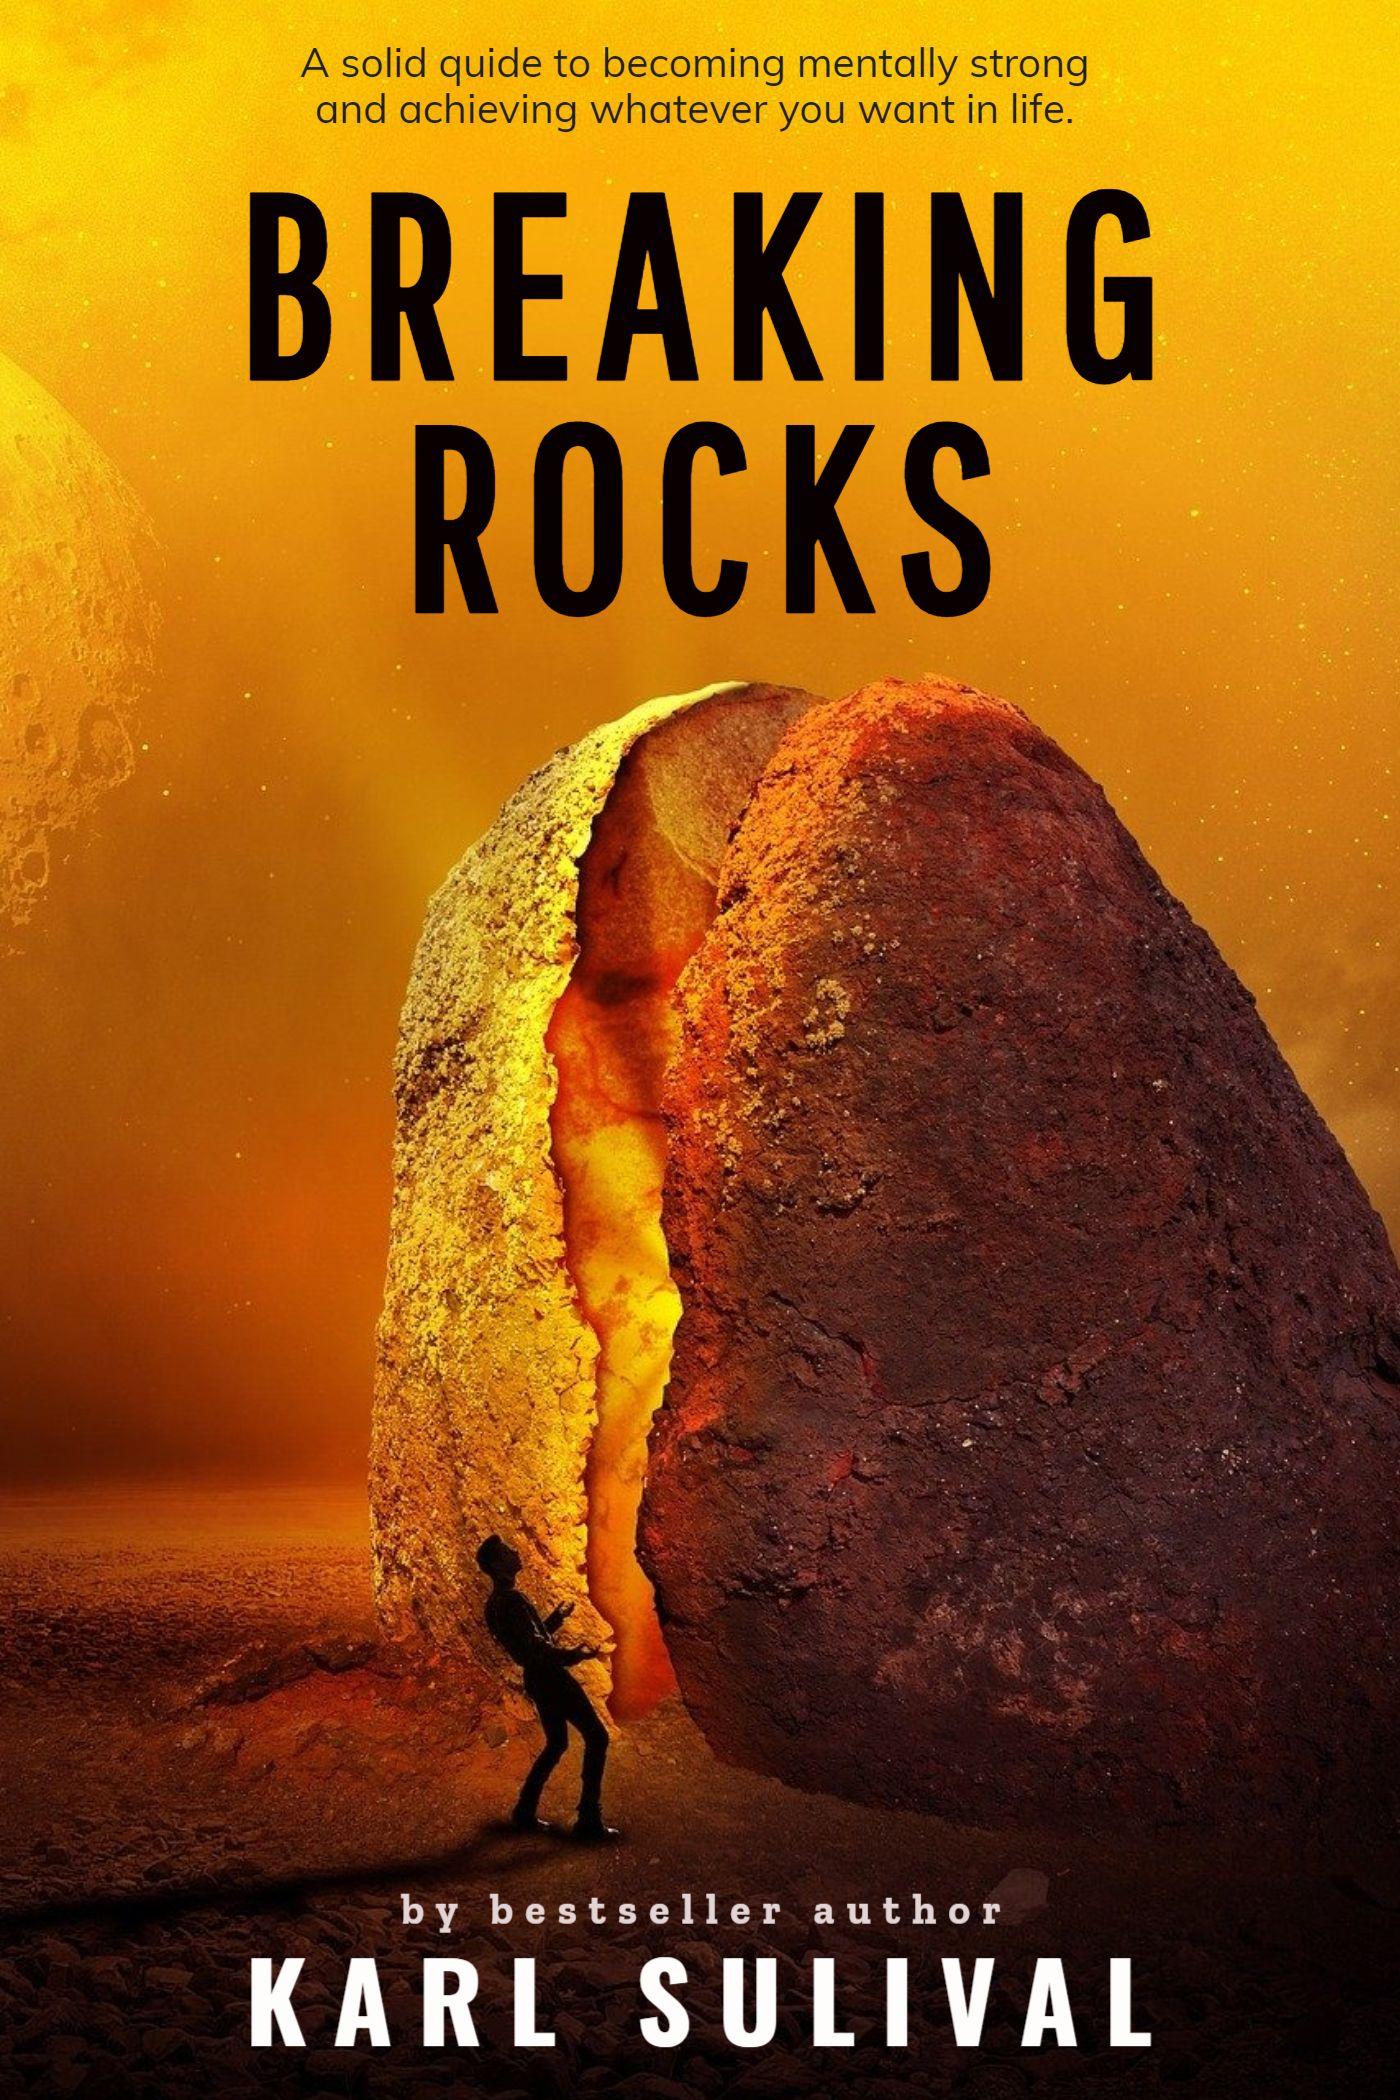 Break Rocks eBook Cover Template